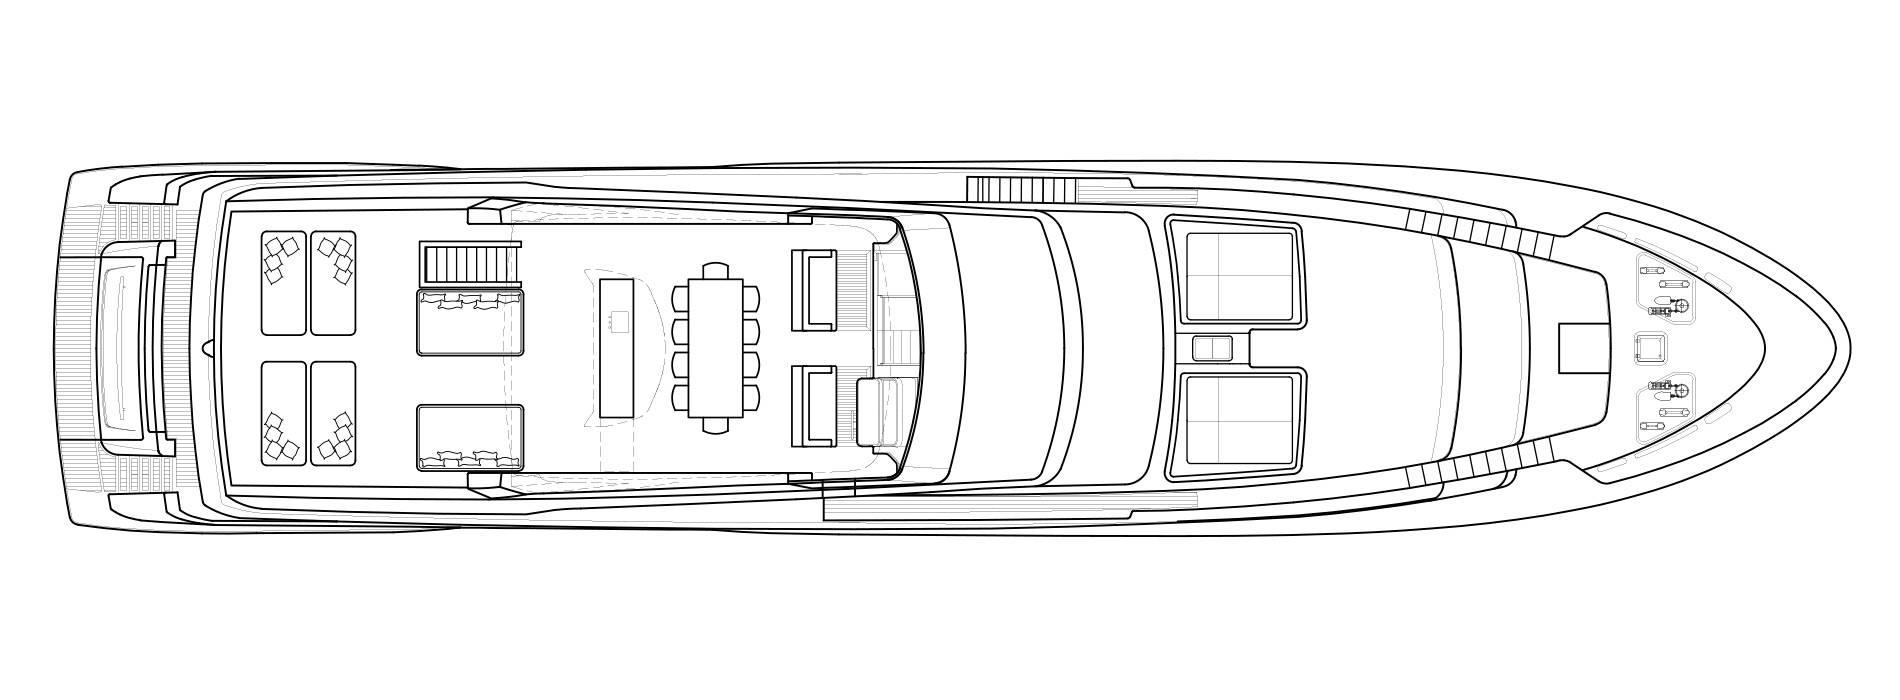 Sanlorenzo Yachts SL118 飞桥